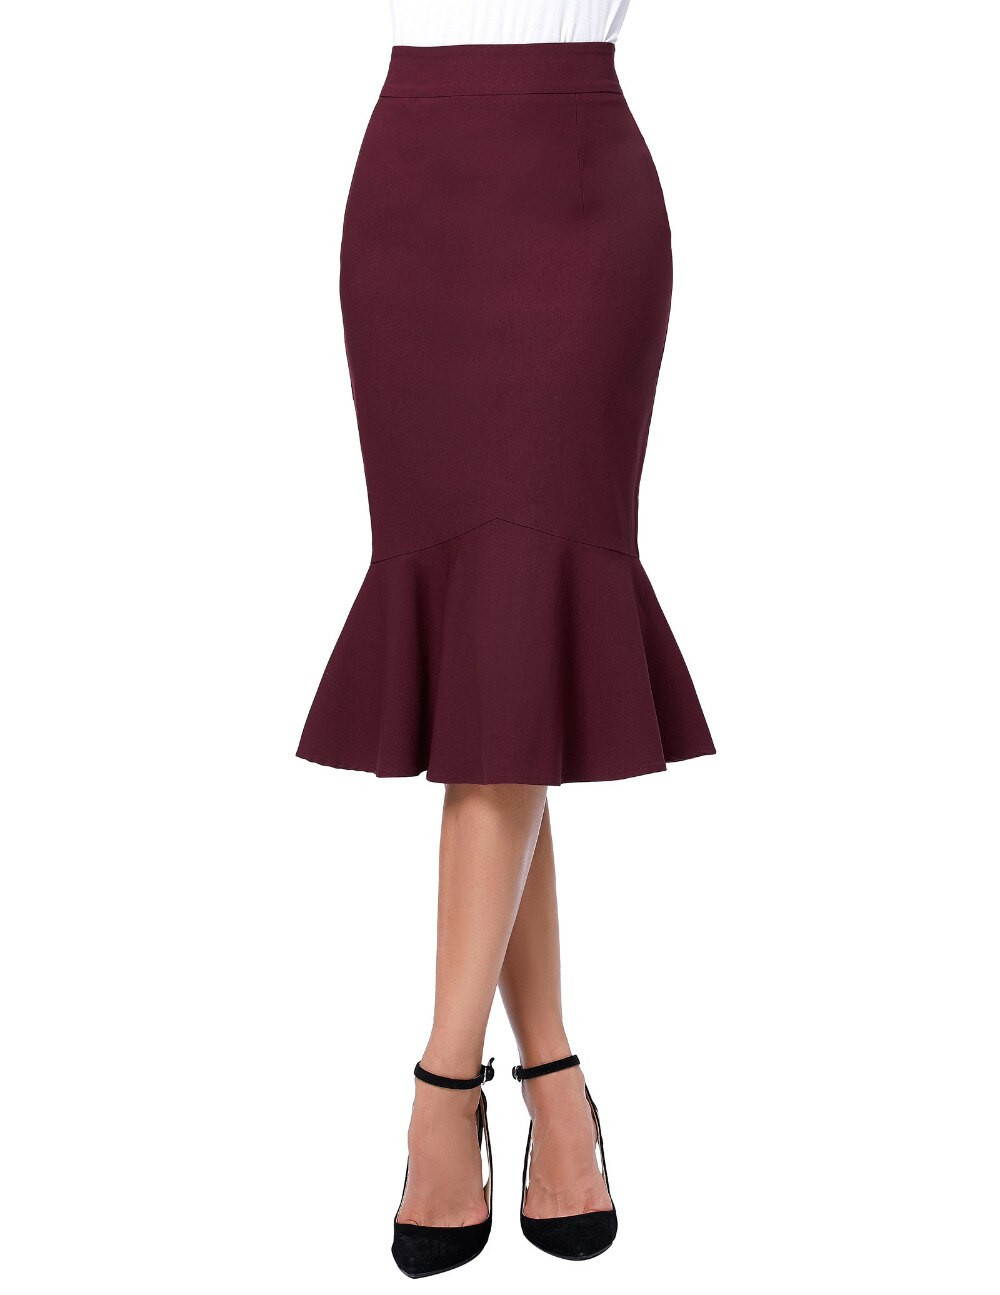 17 Skirts Faldas Women's Fashion OL Casual Mermaid Dark Wine Black Pencil Skirt Jupe Longue High Waist Sexy Long Skirt